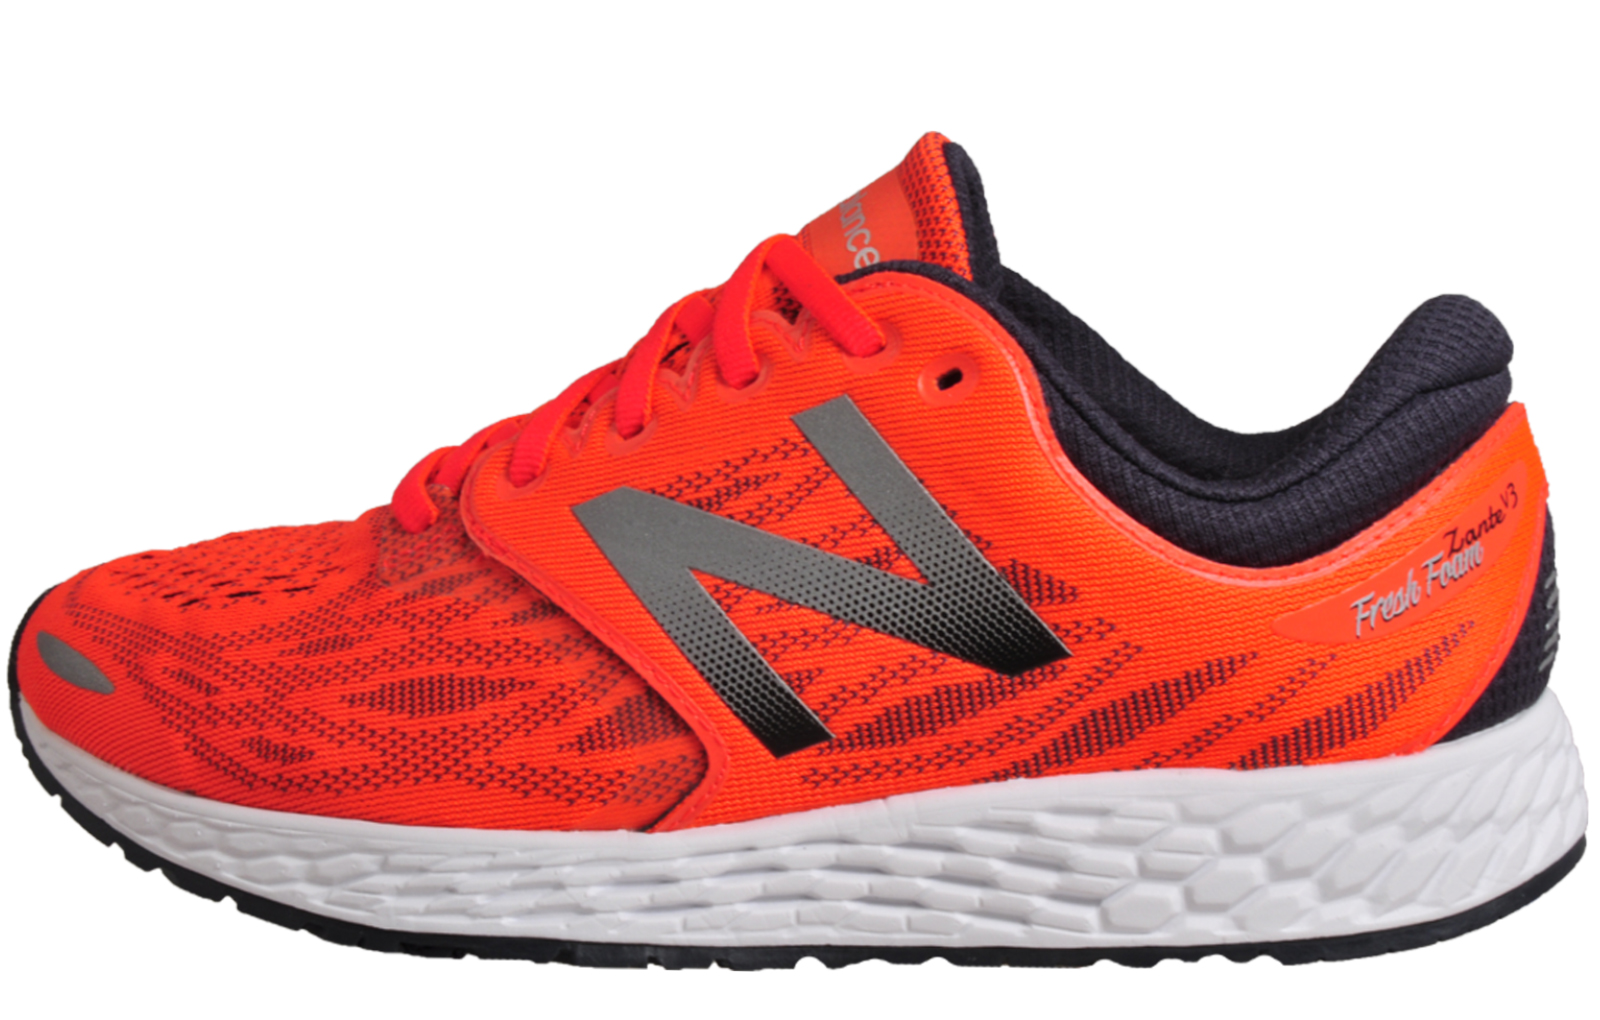 New Balance Zante v3 Fresh Foam Men s High-Performance Running Shoes ... d70bfb490c4a2